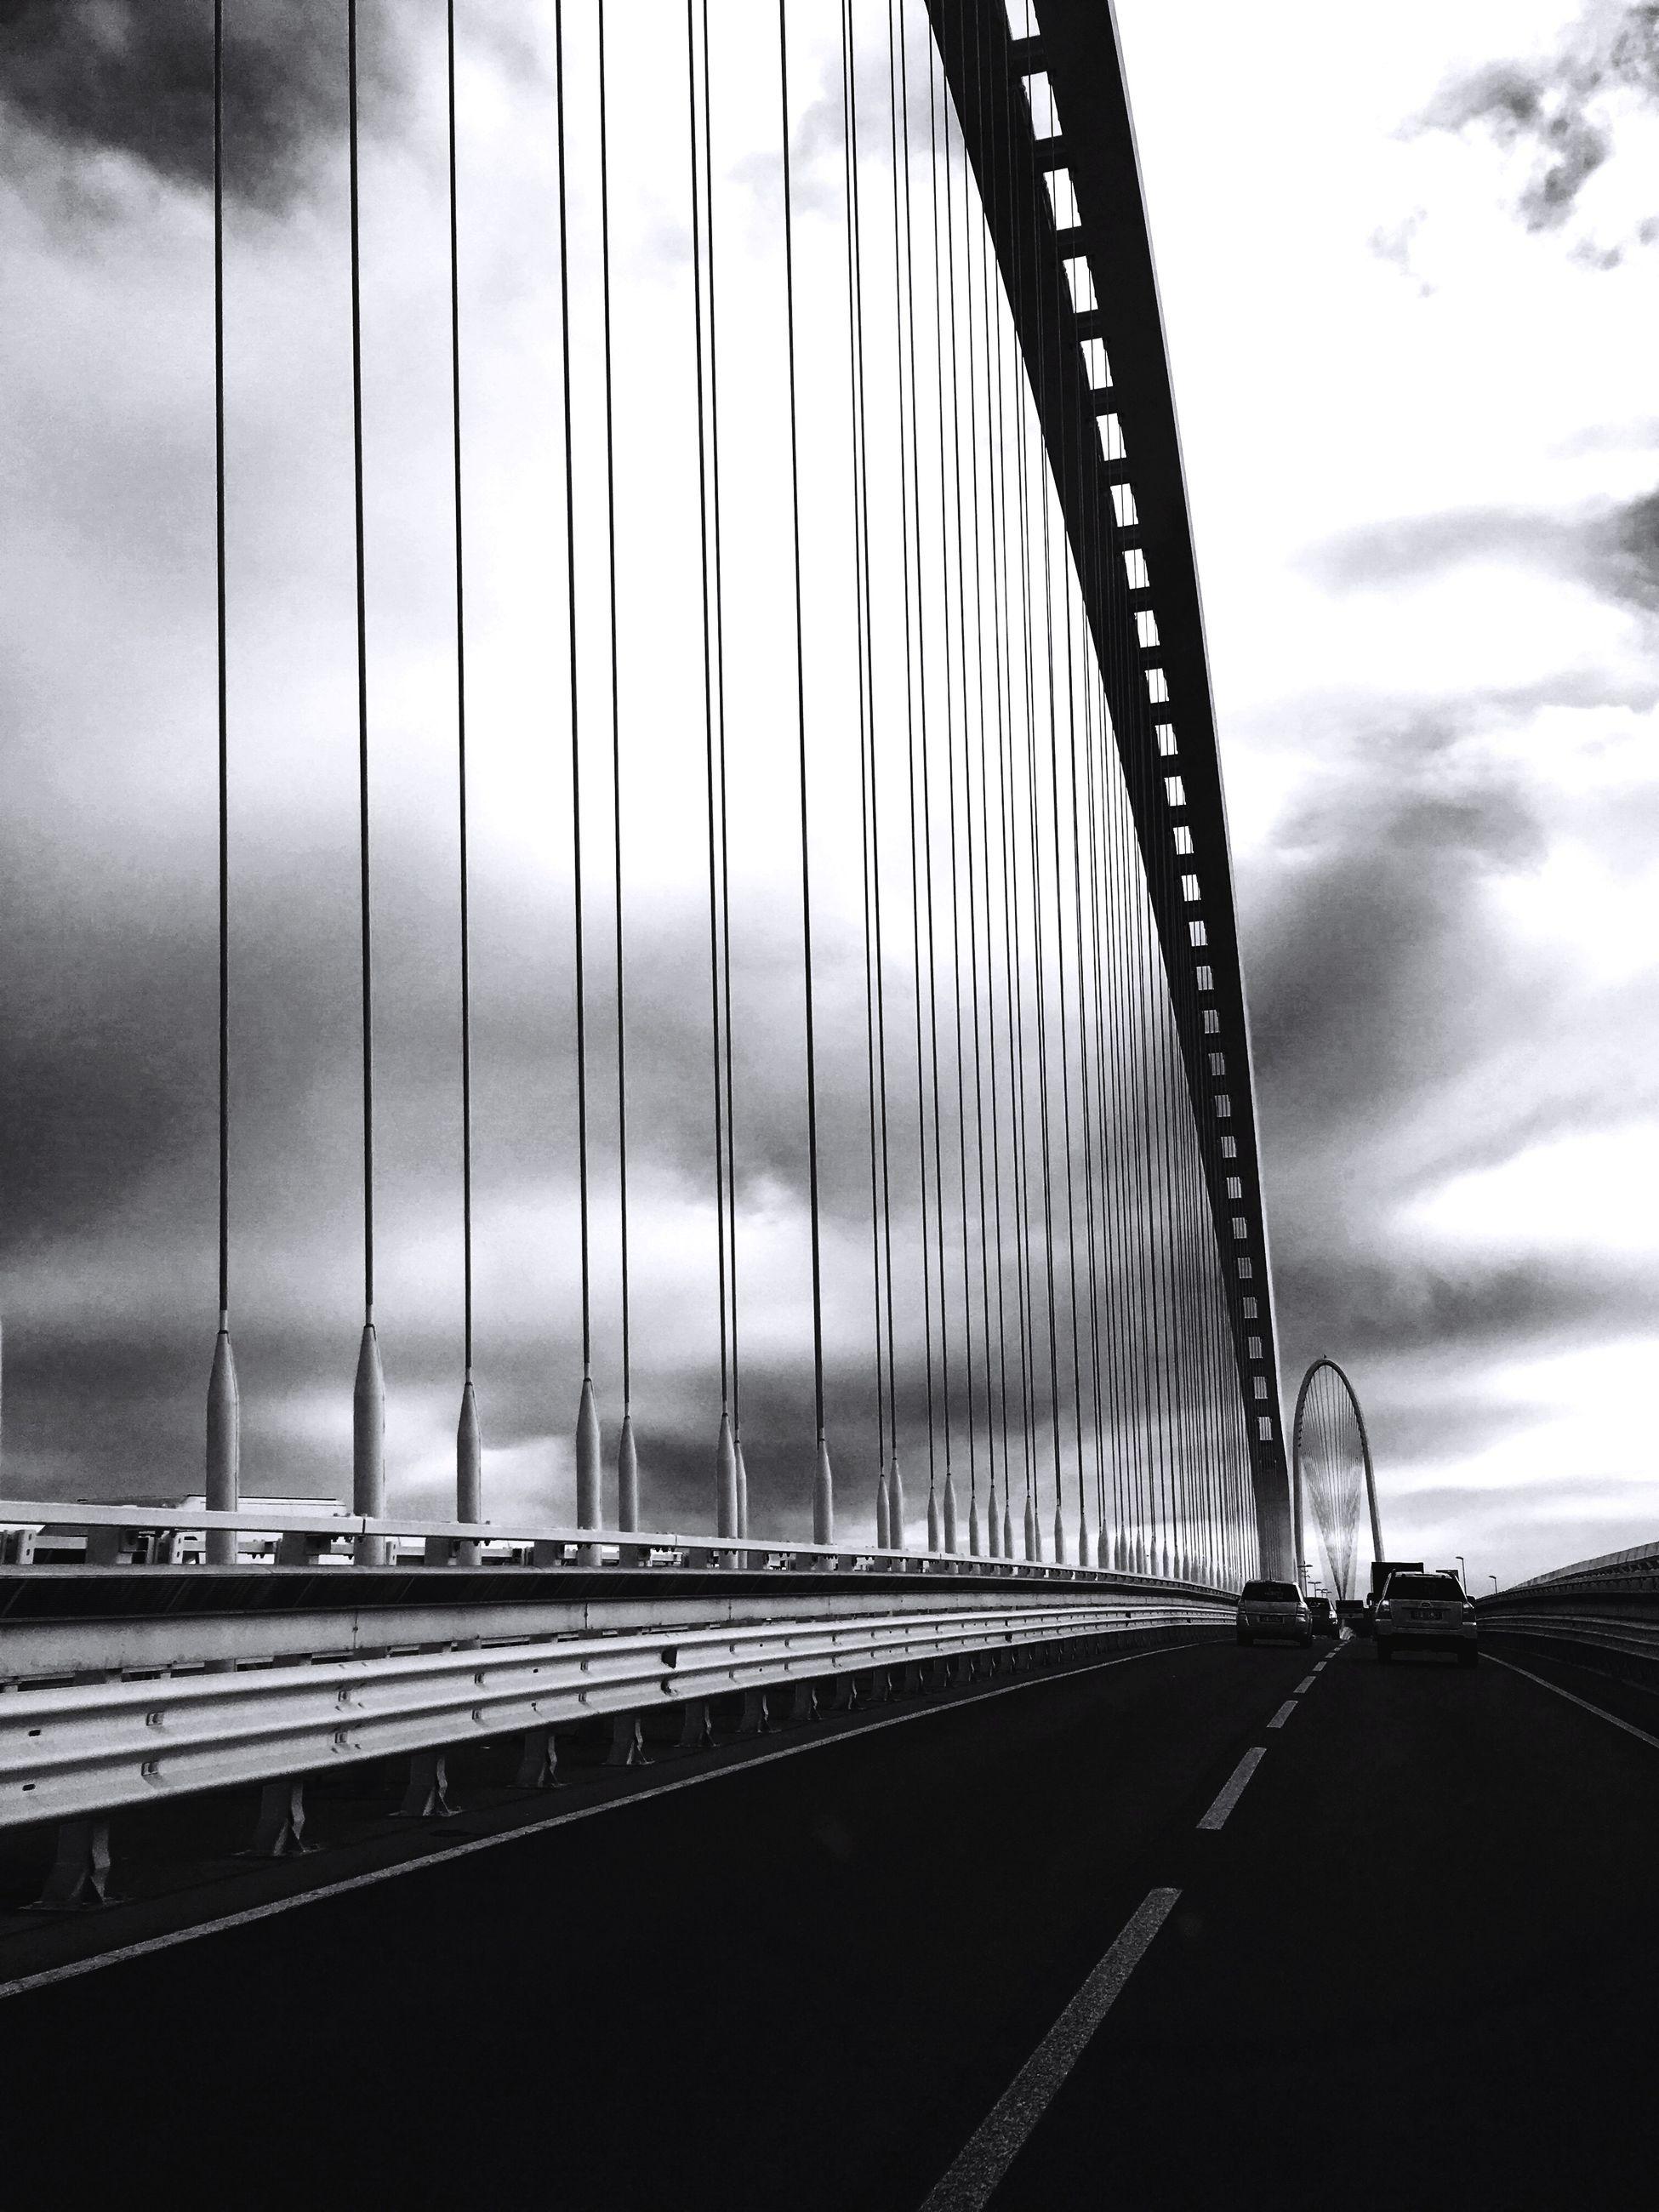 bridge - man made structure, sky, built structure, outdoors, connection, architecture, no people, day, suspension bridge